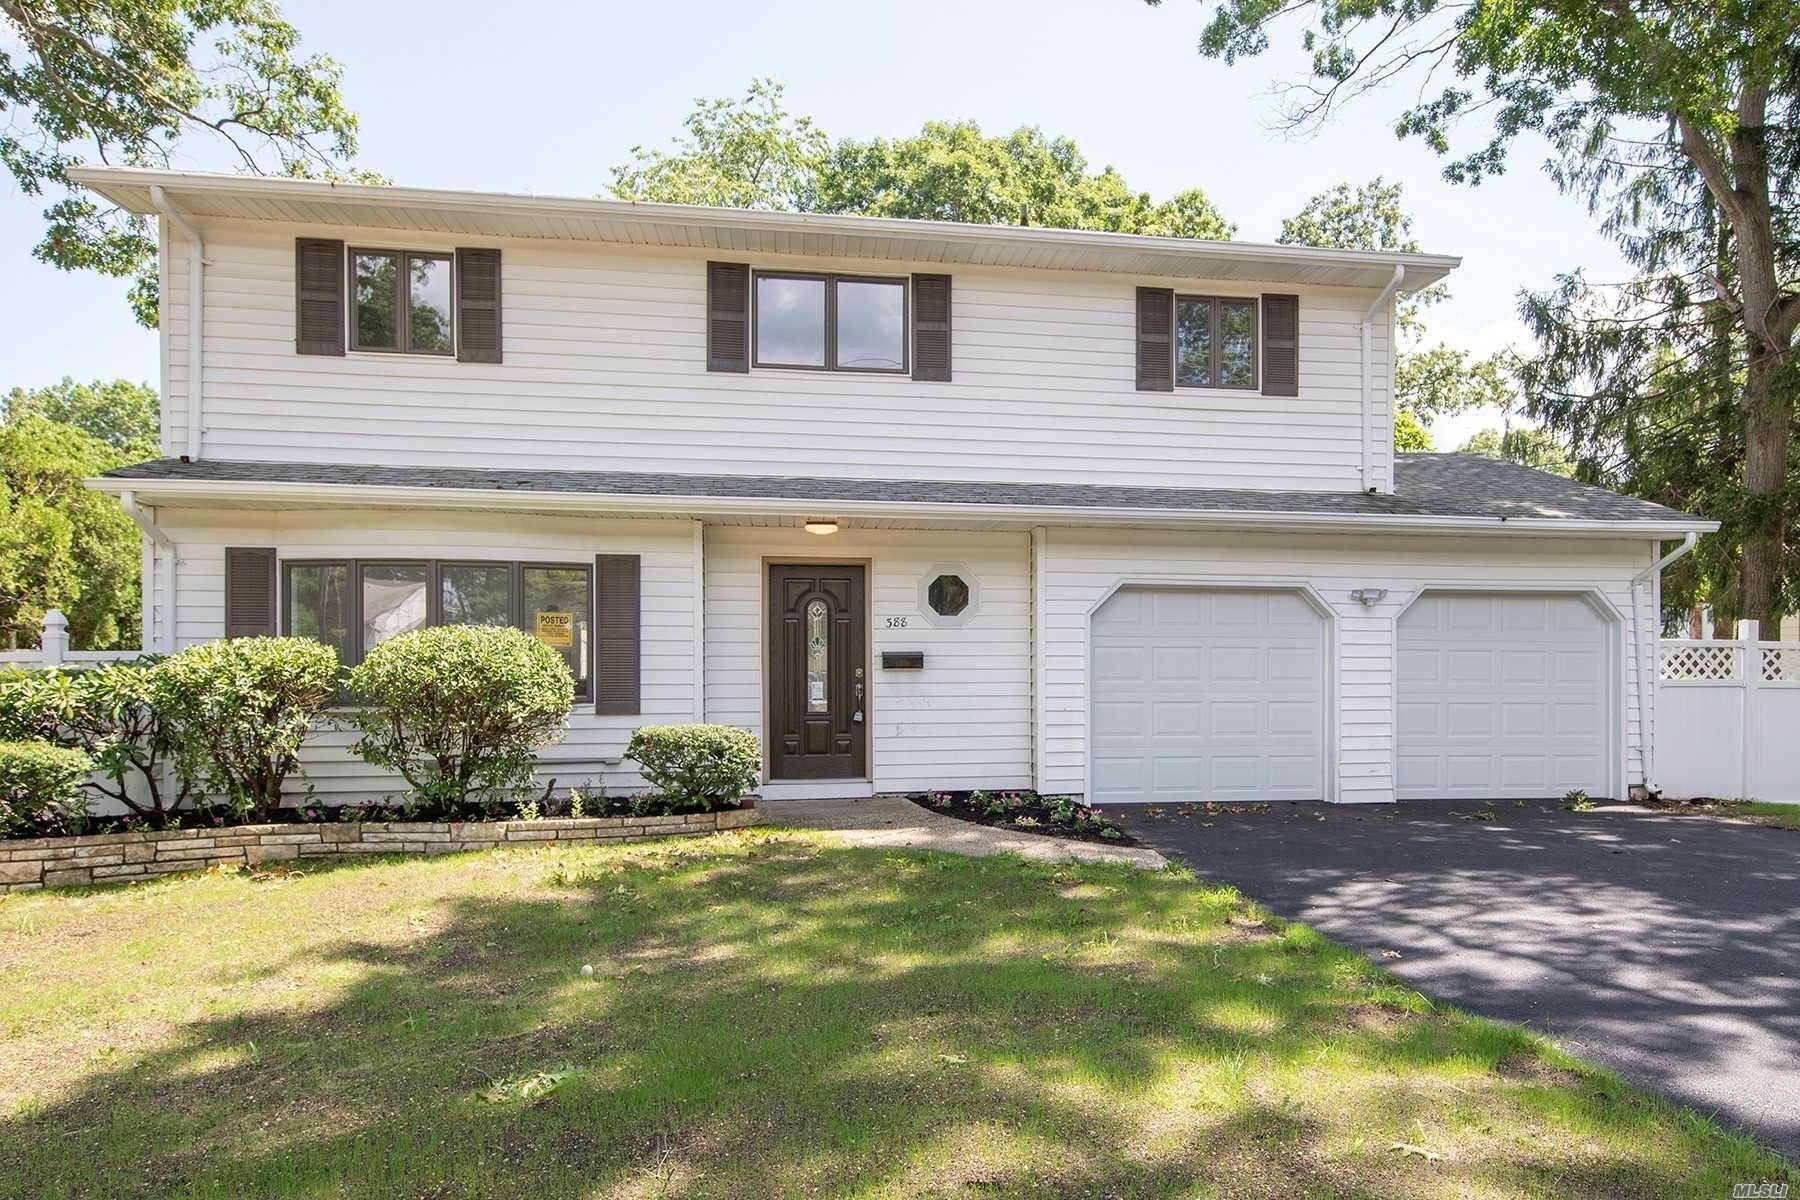 388 Nicolls Road, Deer Park, NY 11729 - MLS#: 3233470